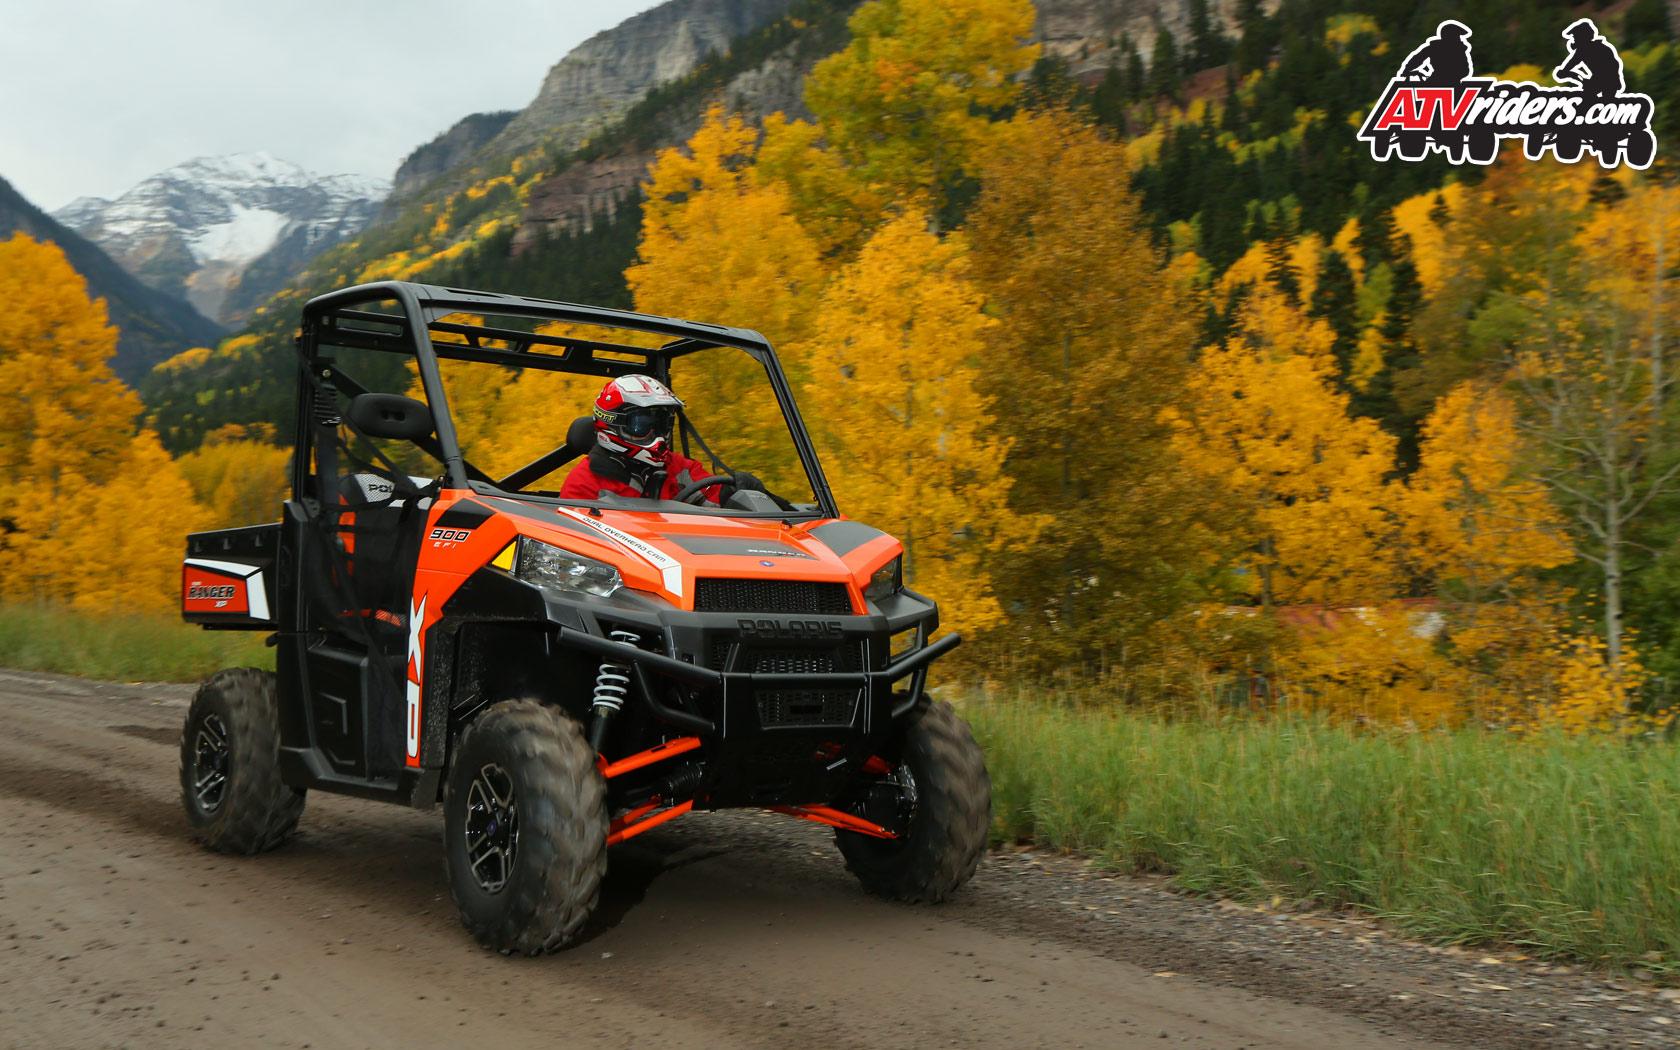 2013 Polaris RANGER XP 900 SxS UTV   Imogene Pass Colorado 1680x1050